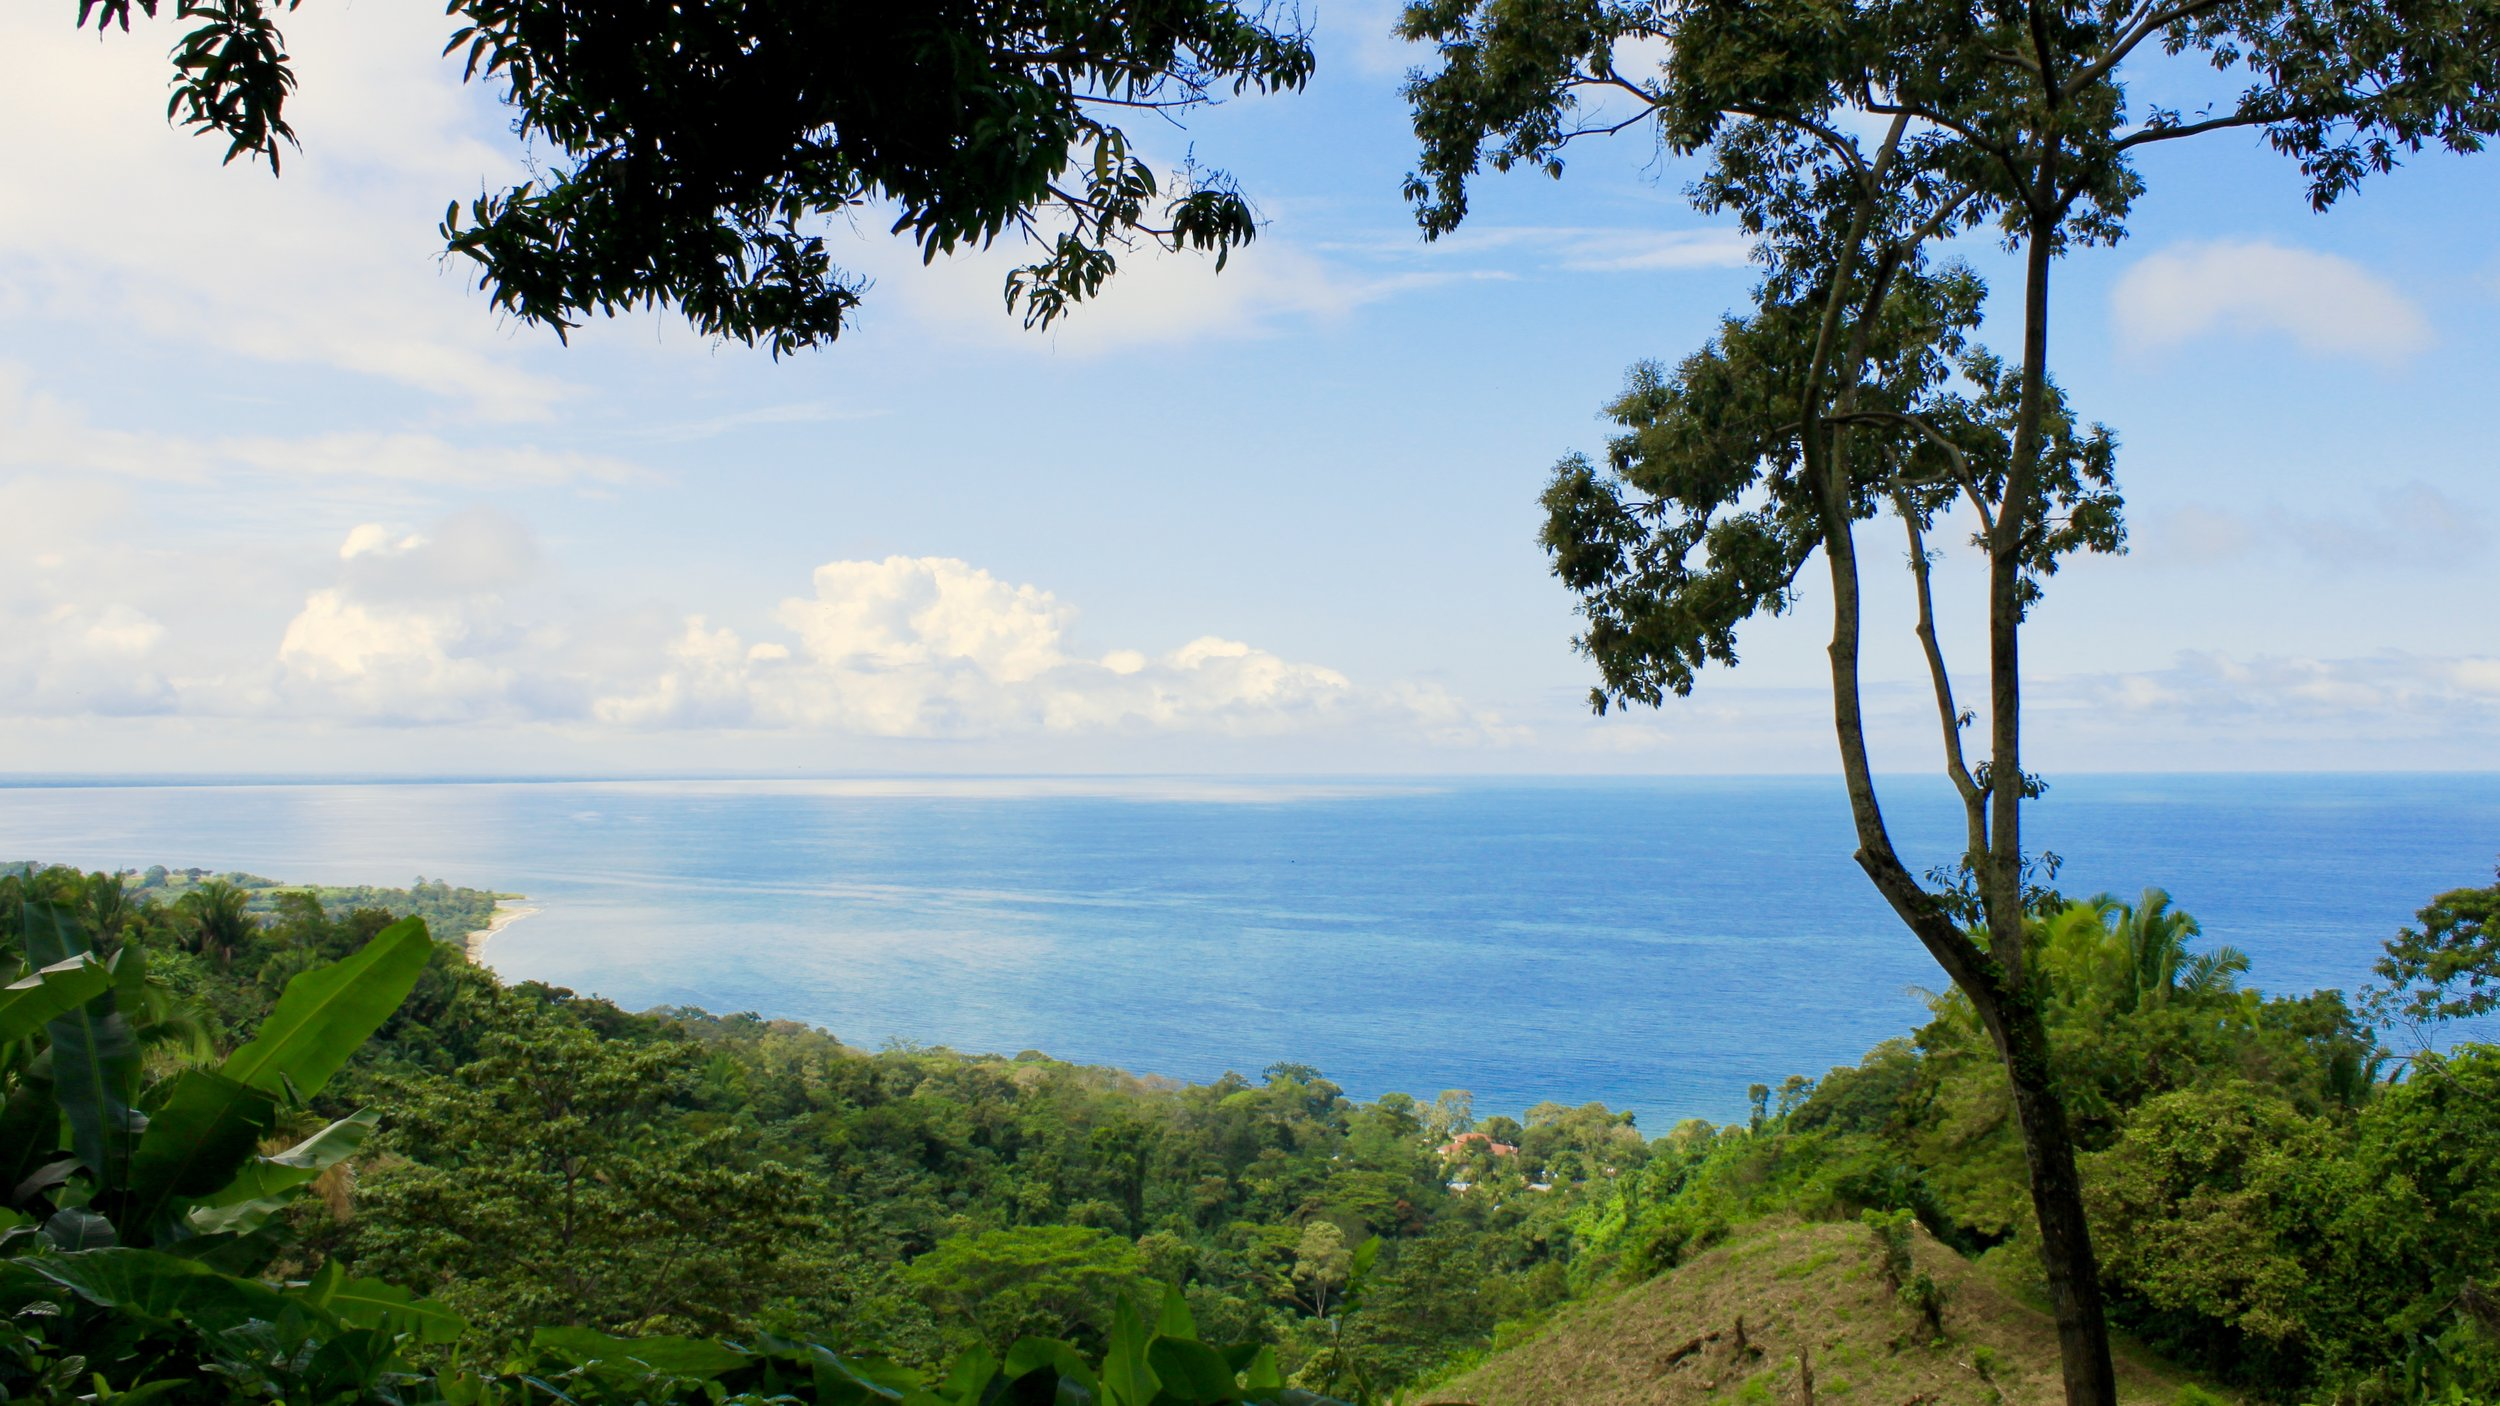 This is nowhere near the Darién Gap. This is actually Puerto Cortes, Honduras.